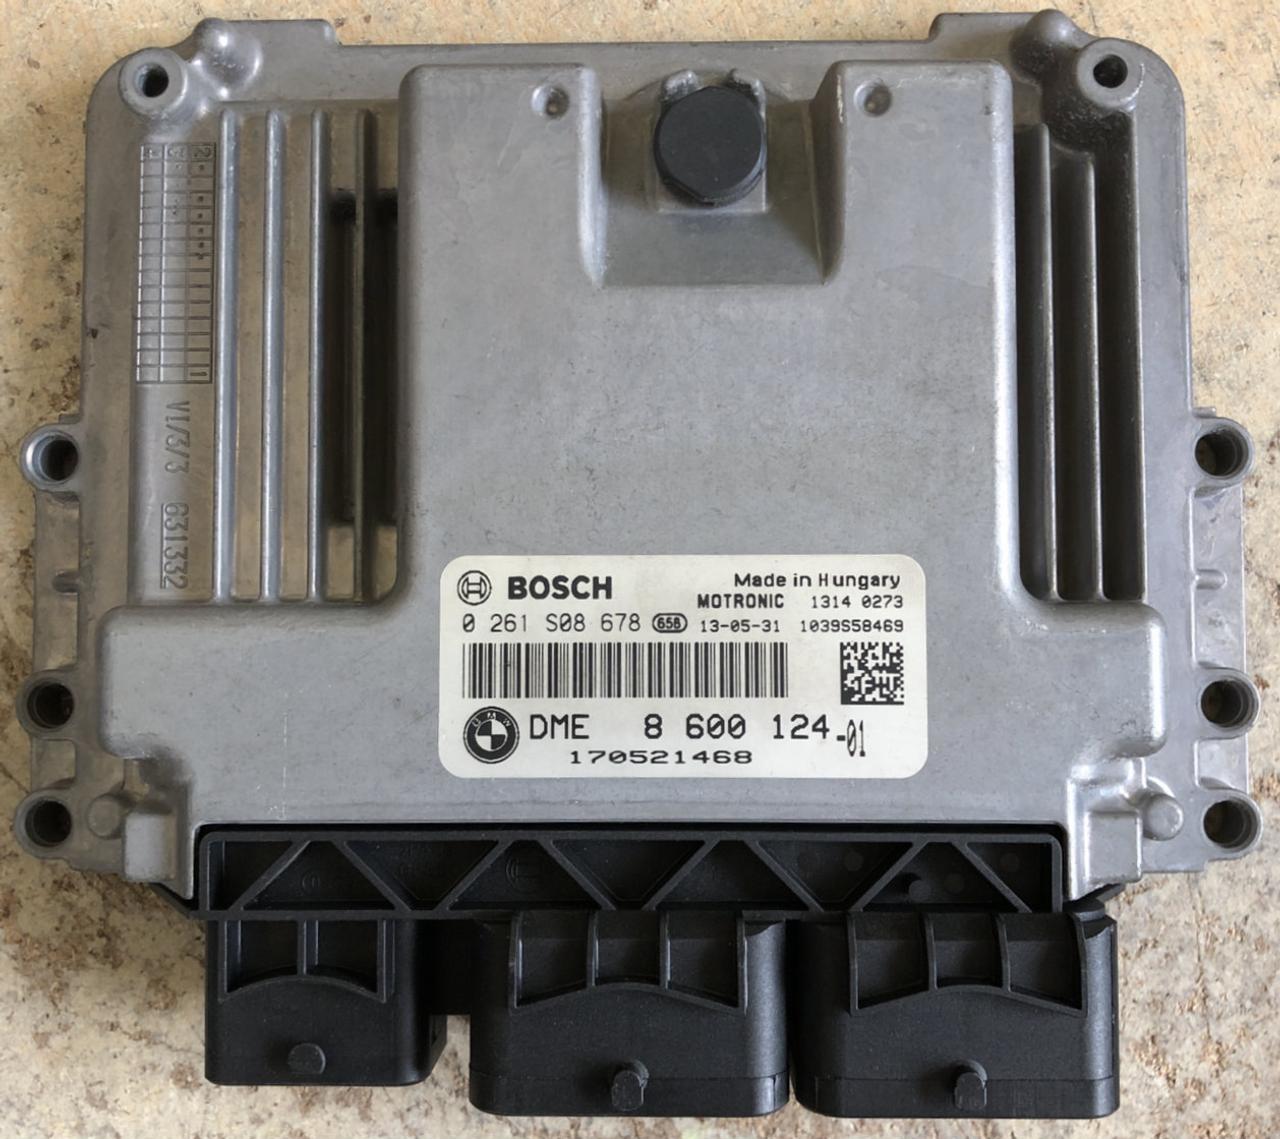 Plug & Play Bosch Engine ECU, Mini Cooper, 0261S08678, 0 261 S08 678,  DME8600124, DME 8 600 124